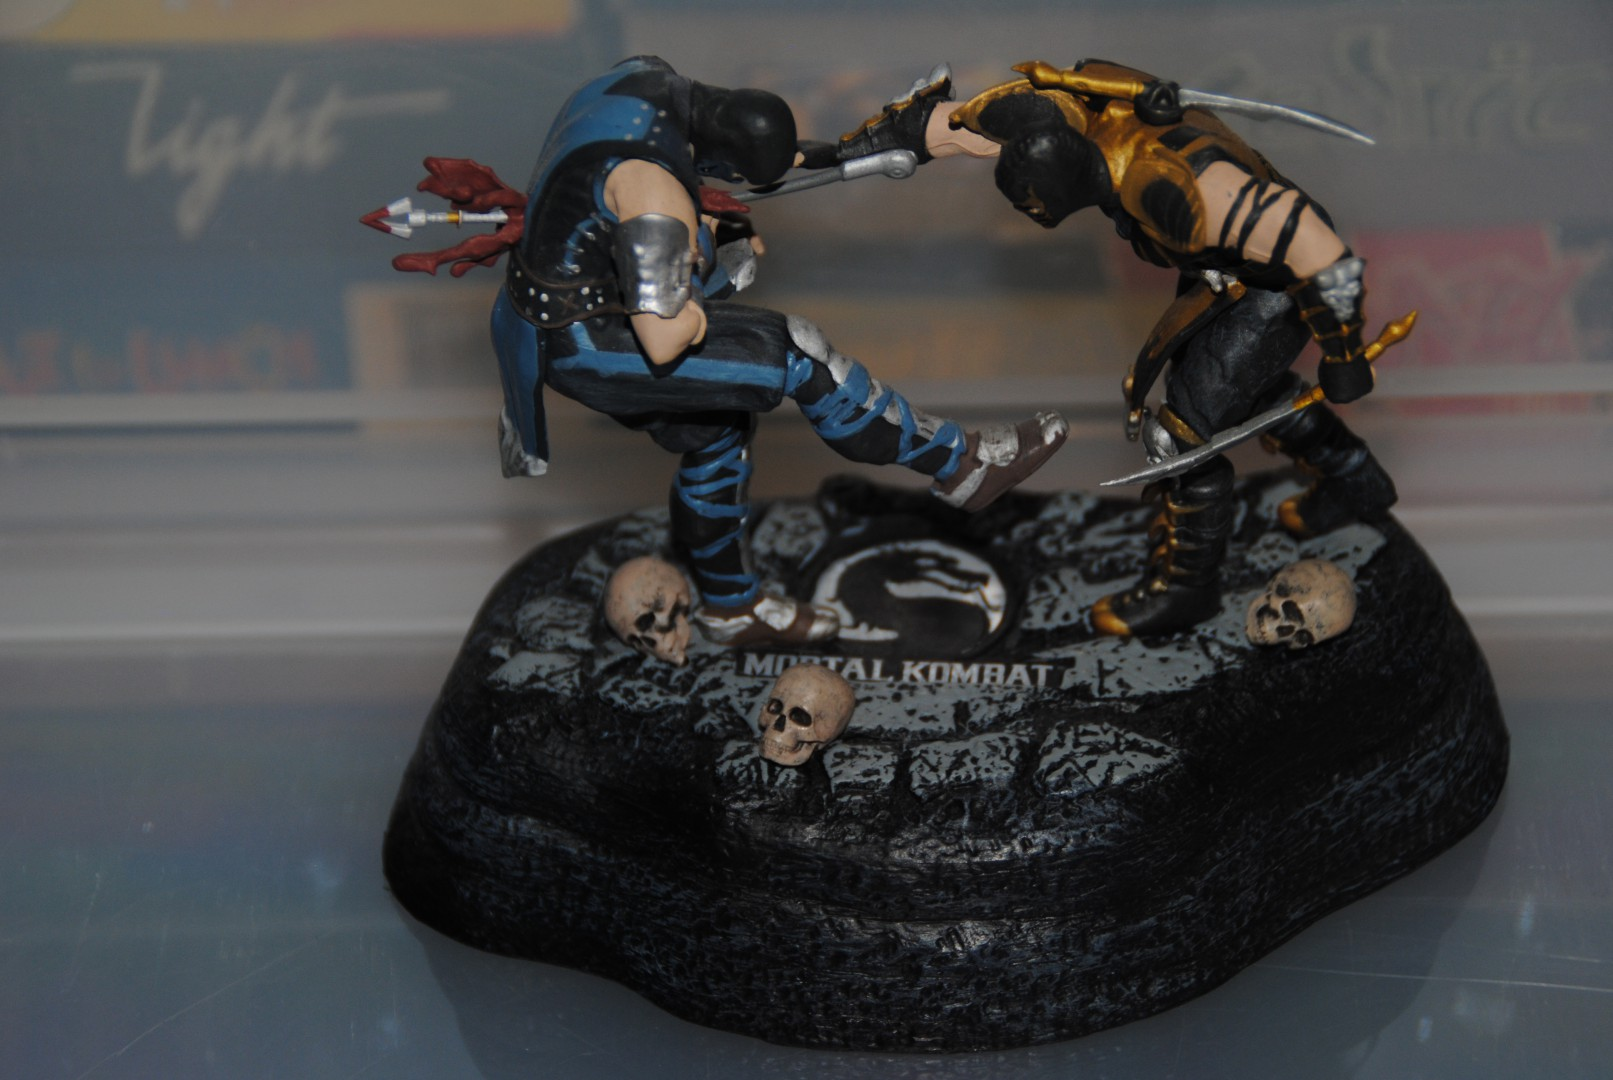 Diorama - Posture Mortal Kombat